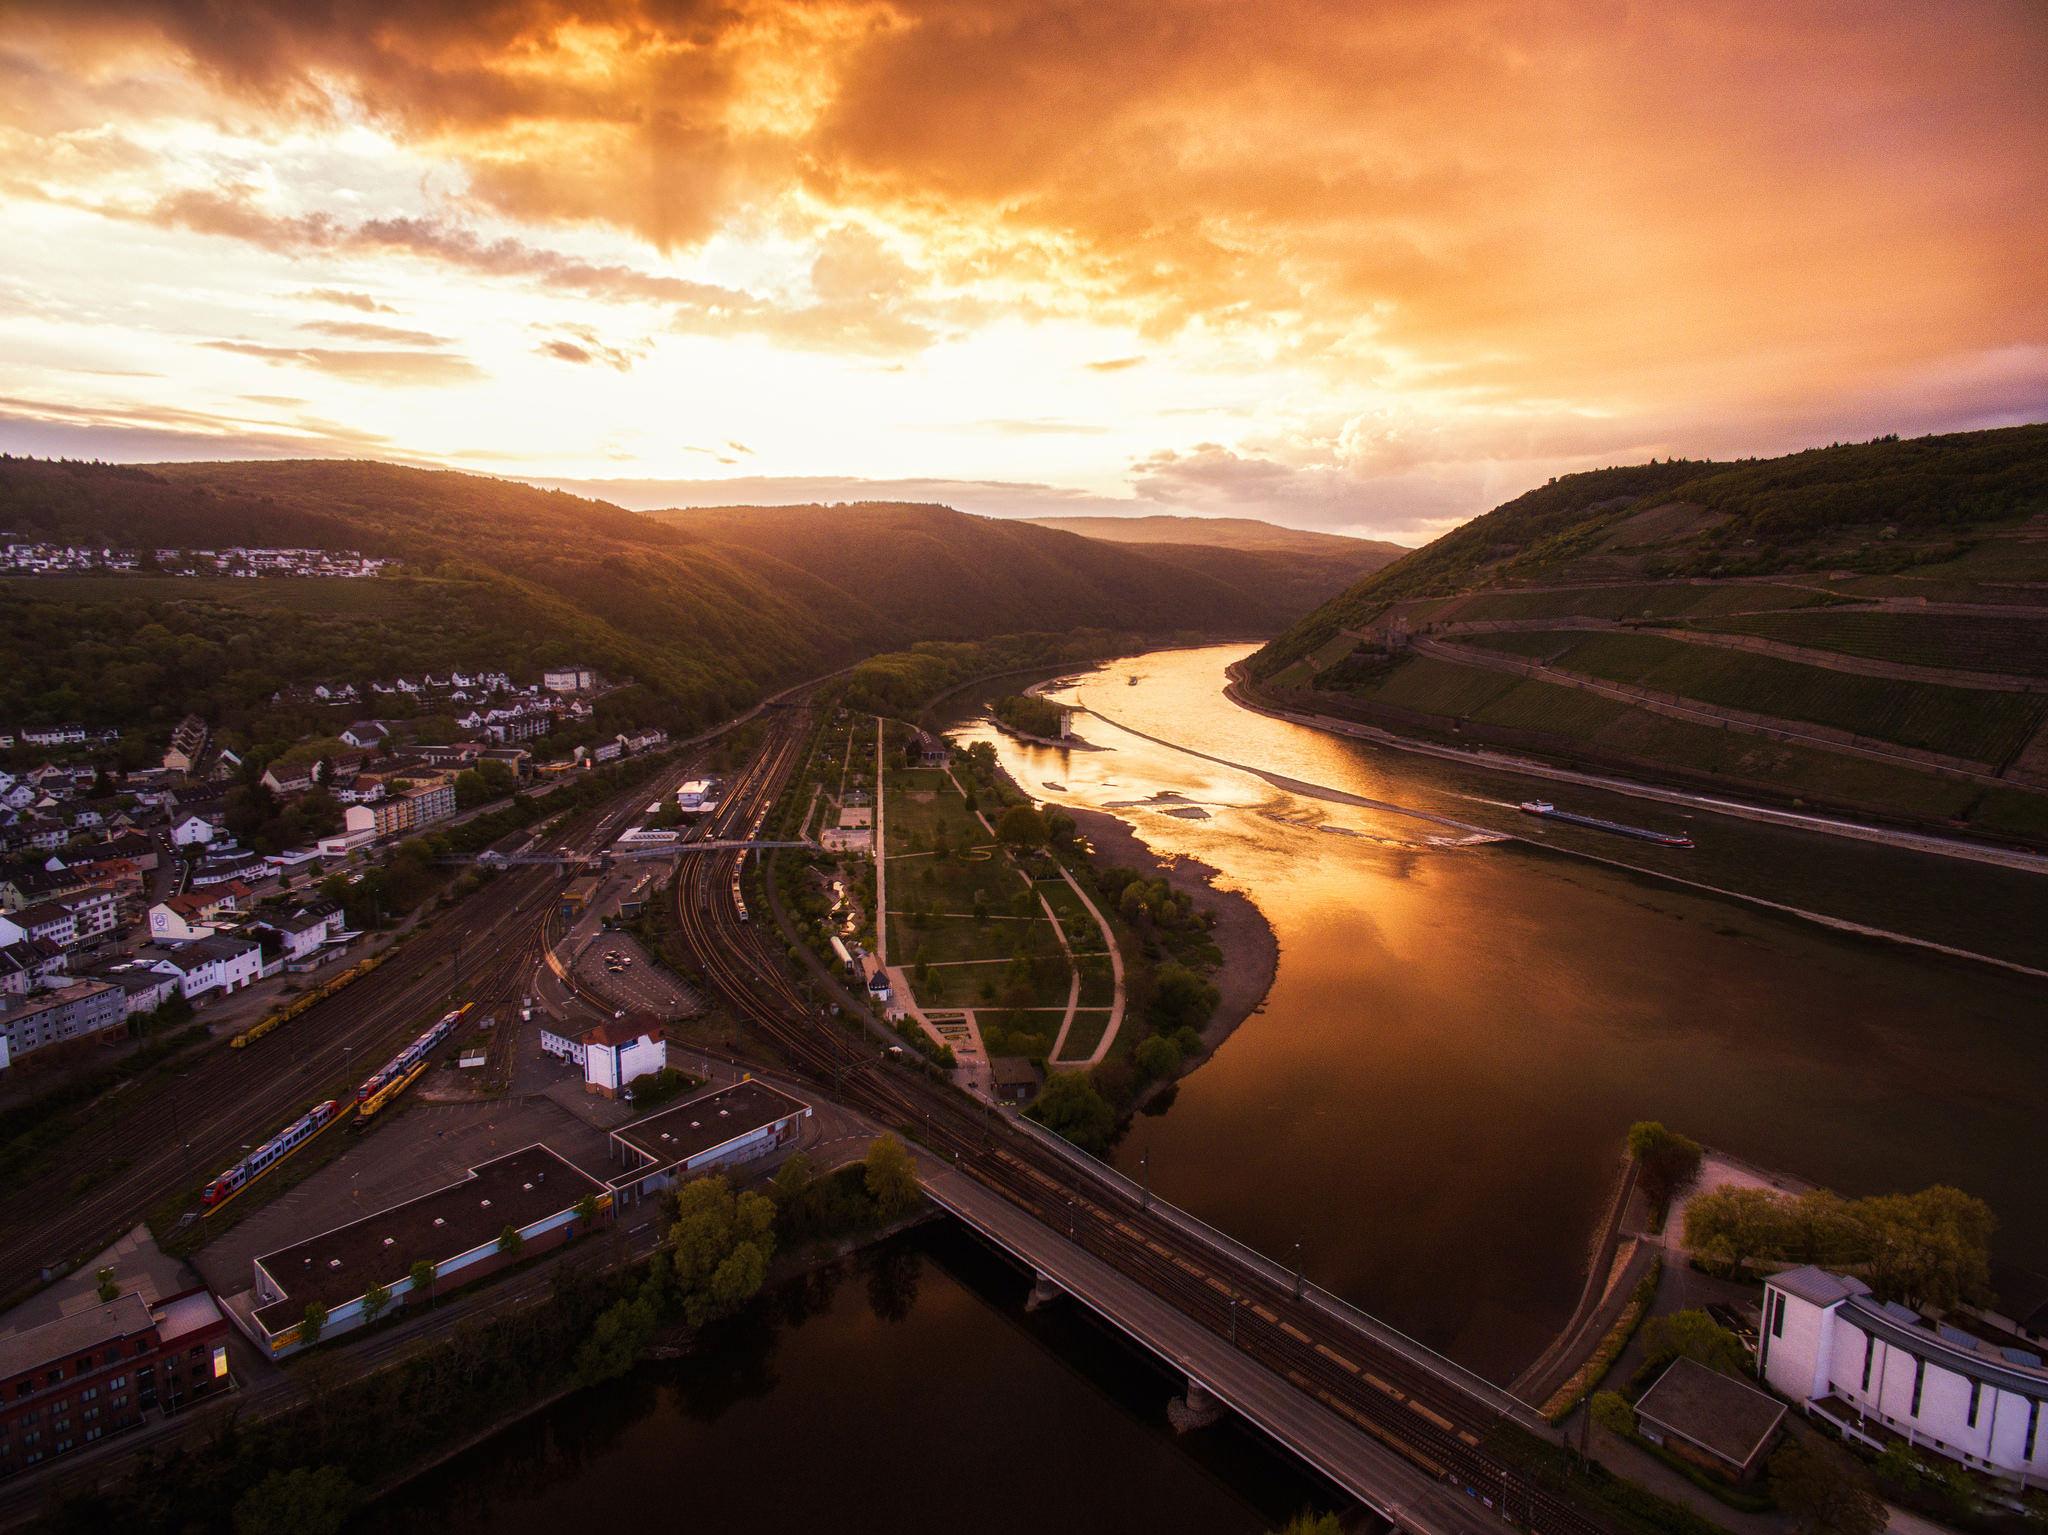 Landschaftsfotografie fotograf filmemacher frankfurt patrick schmetzer drohne landschaft natur 20